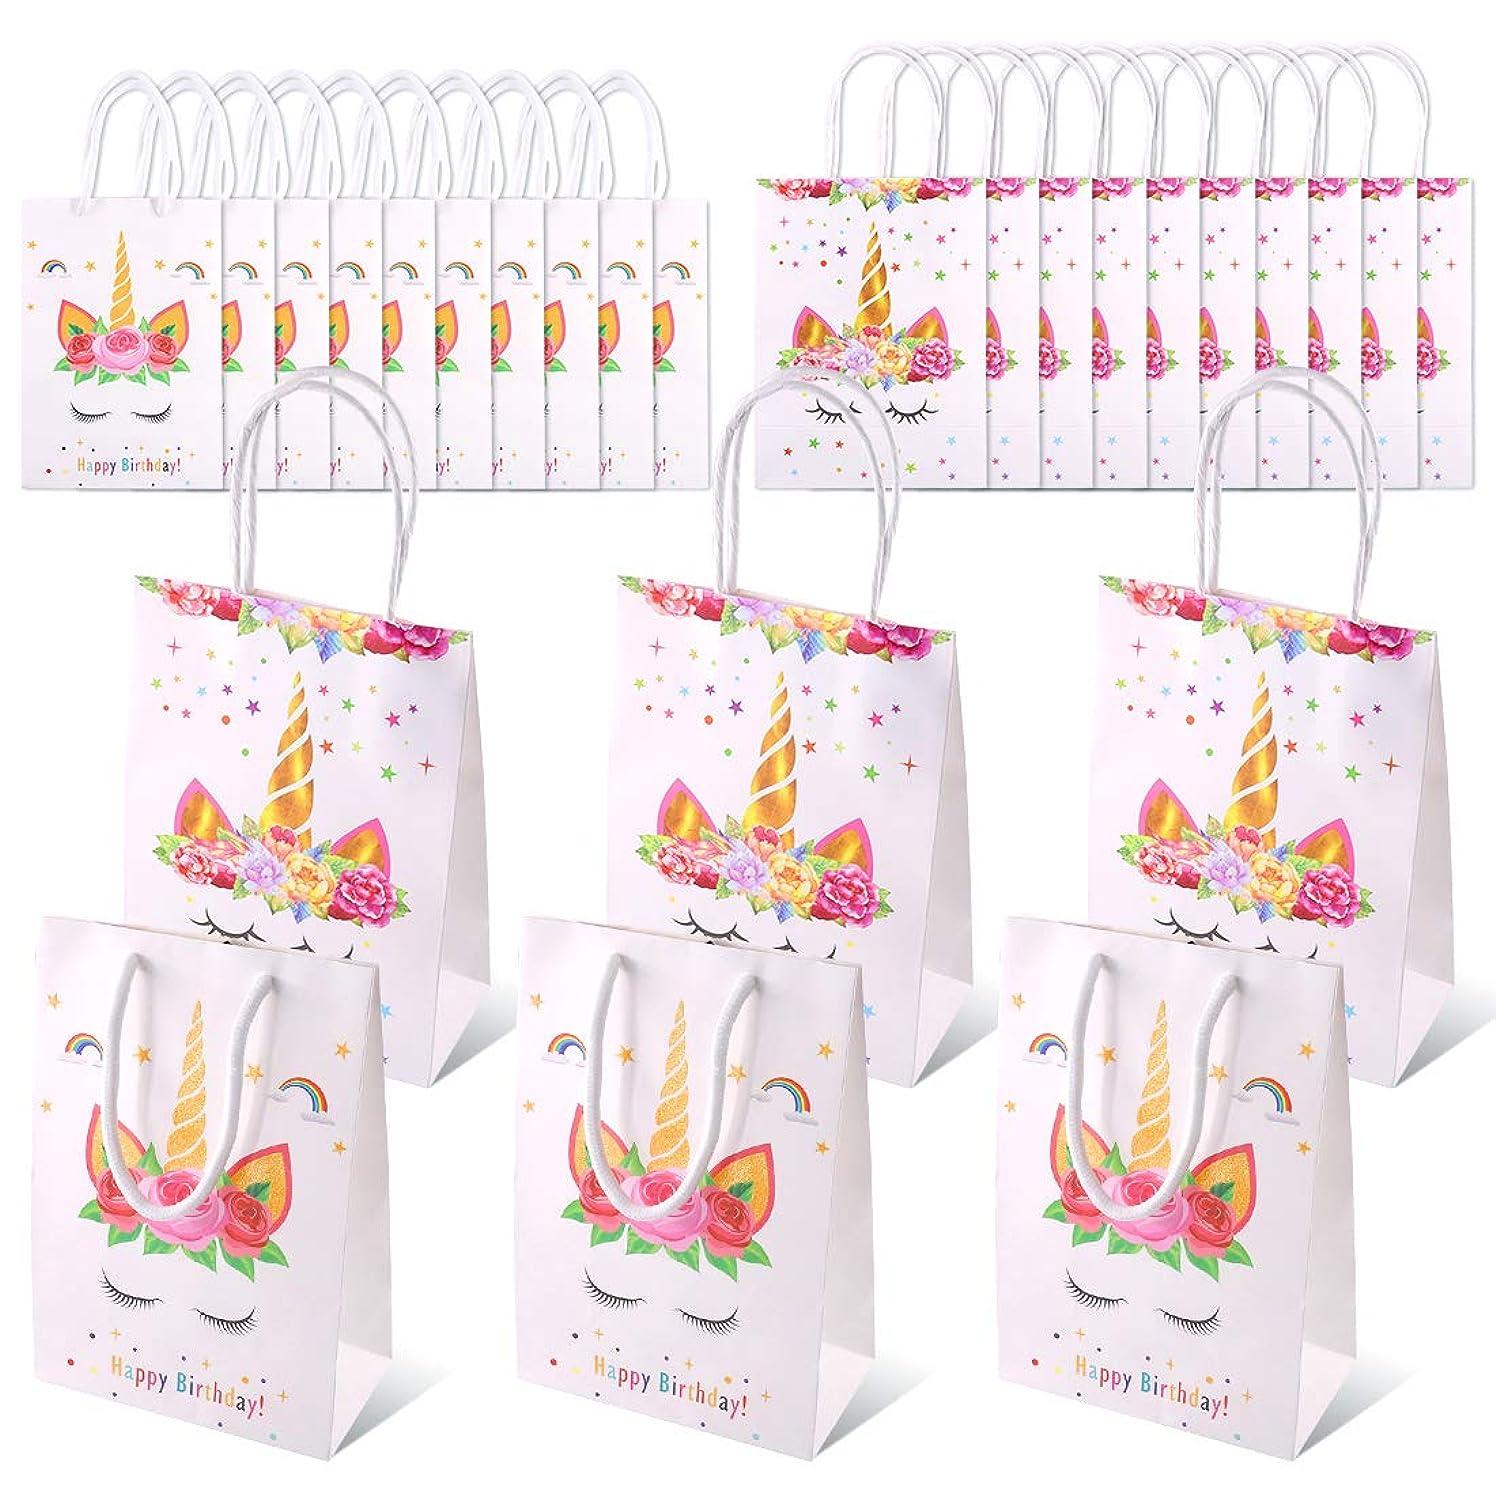 Swpeet 20Pcs Unicorn Paper Gift Wraping Bags Kit, Paper Goodie Bag Glitter Treat Gift Bags for Unicorn Birthday Party Birthday Baby Shower Wedding Gift Bag